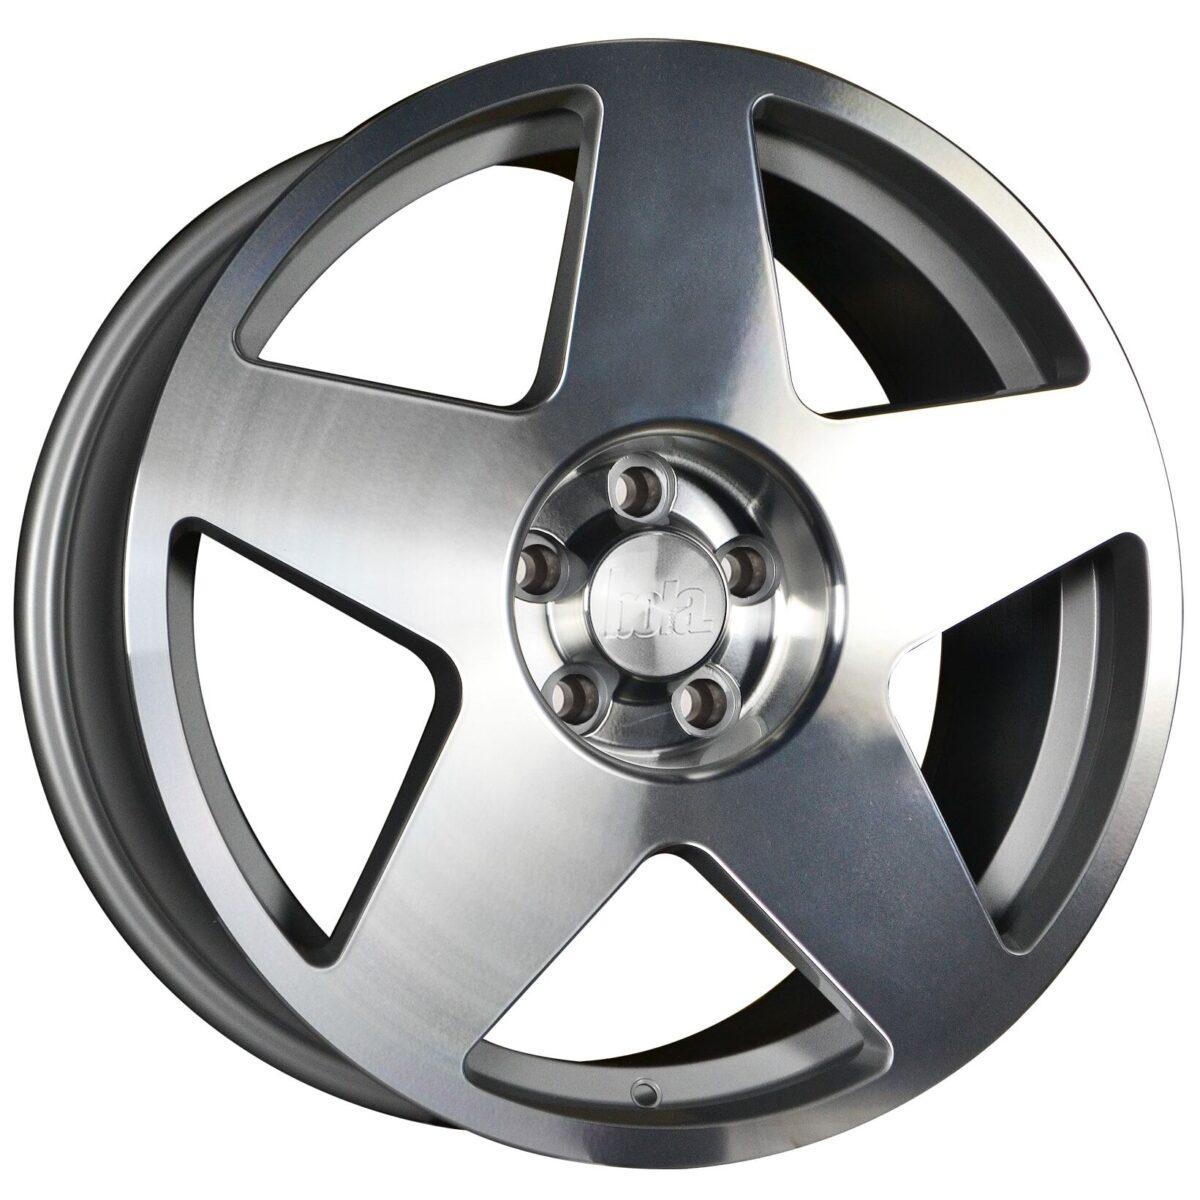 "18"" BOLA B10 Wheels - Silver Polished Face - All BMW Models"